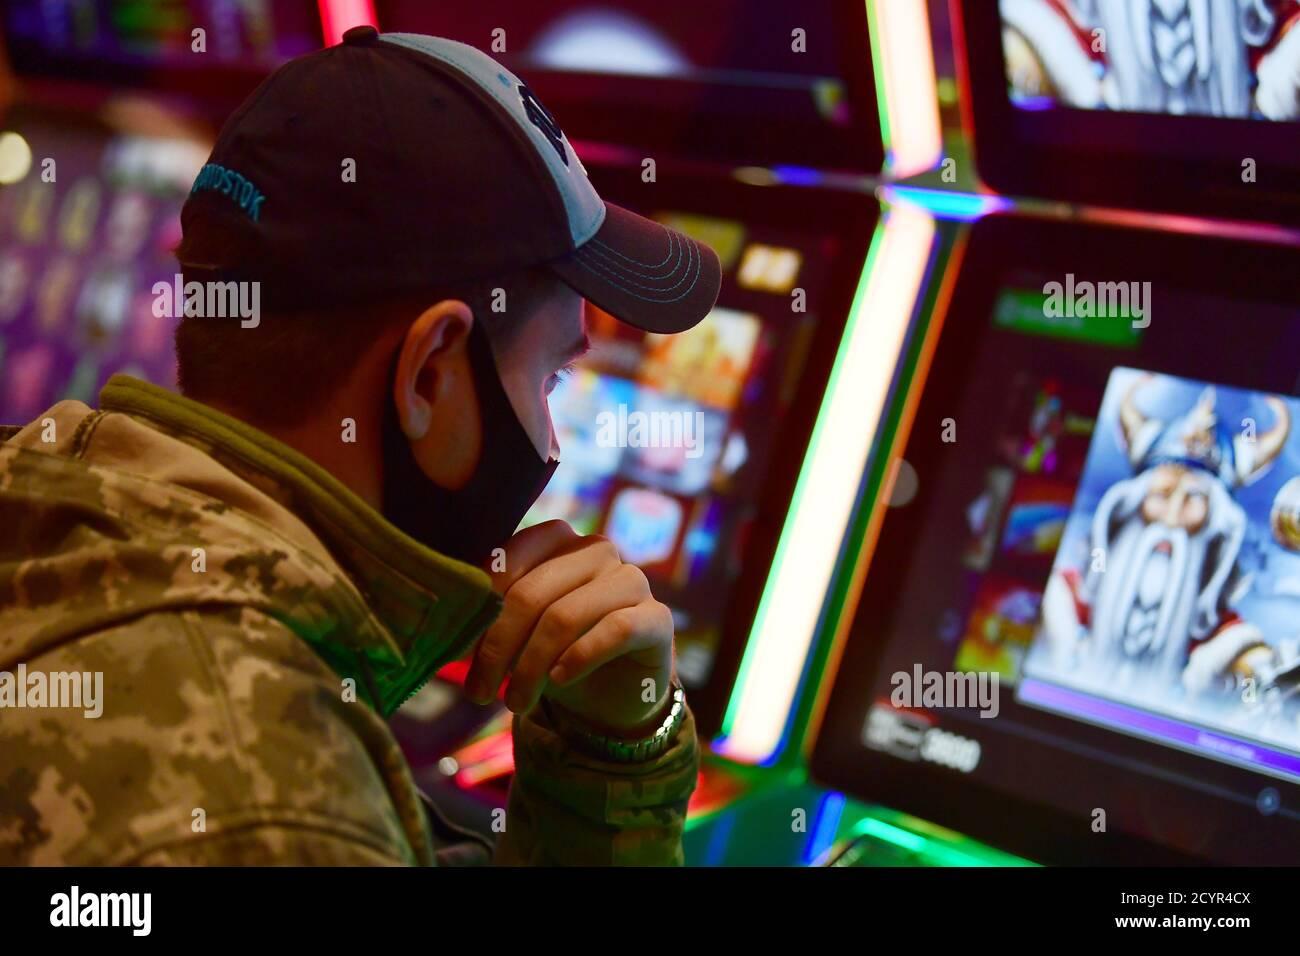 Primorye Territory Russia 2nd Oct 2020 A Man Plays A Slot Machine At Shambala Casino In